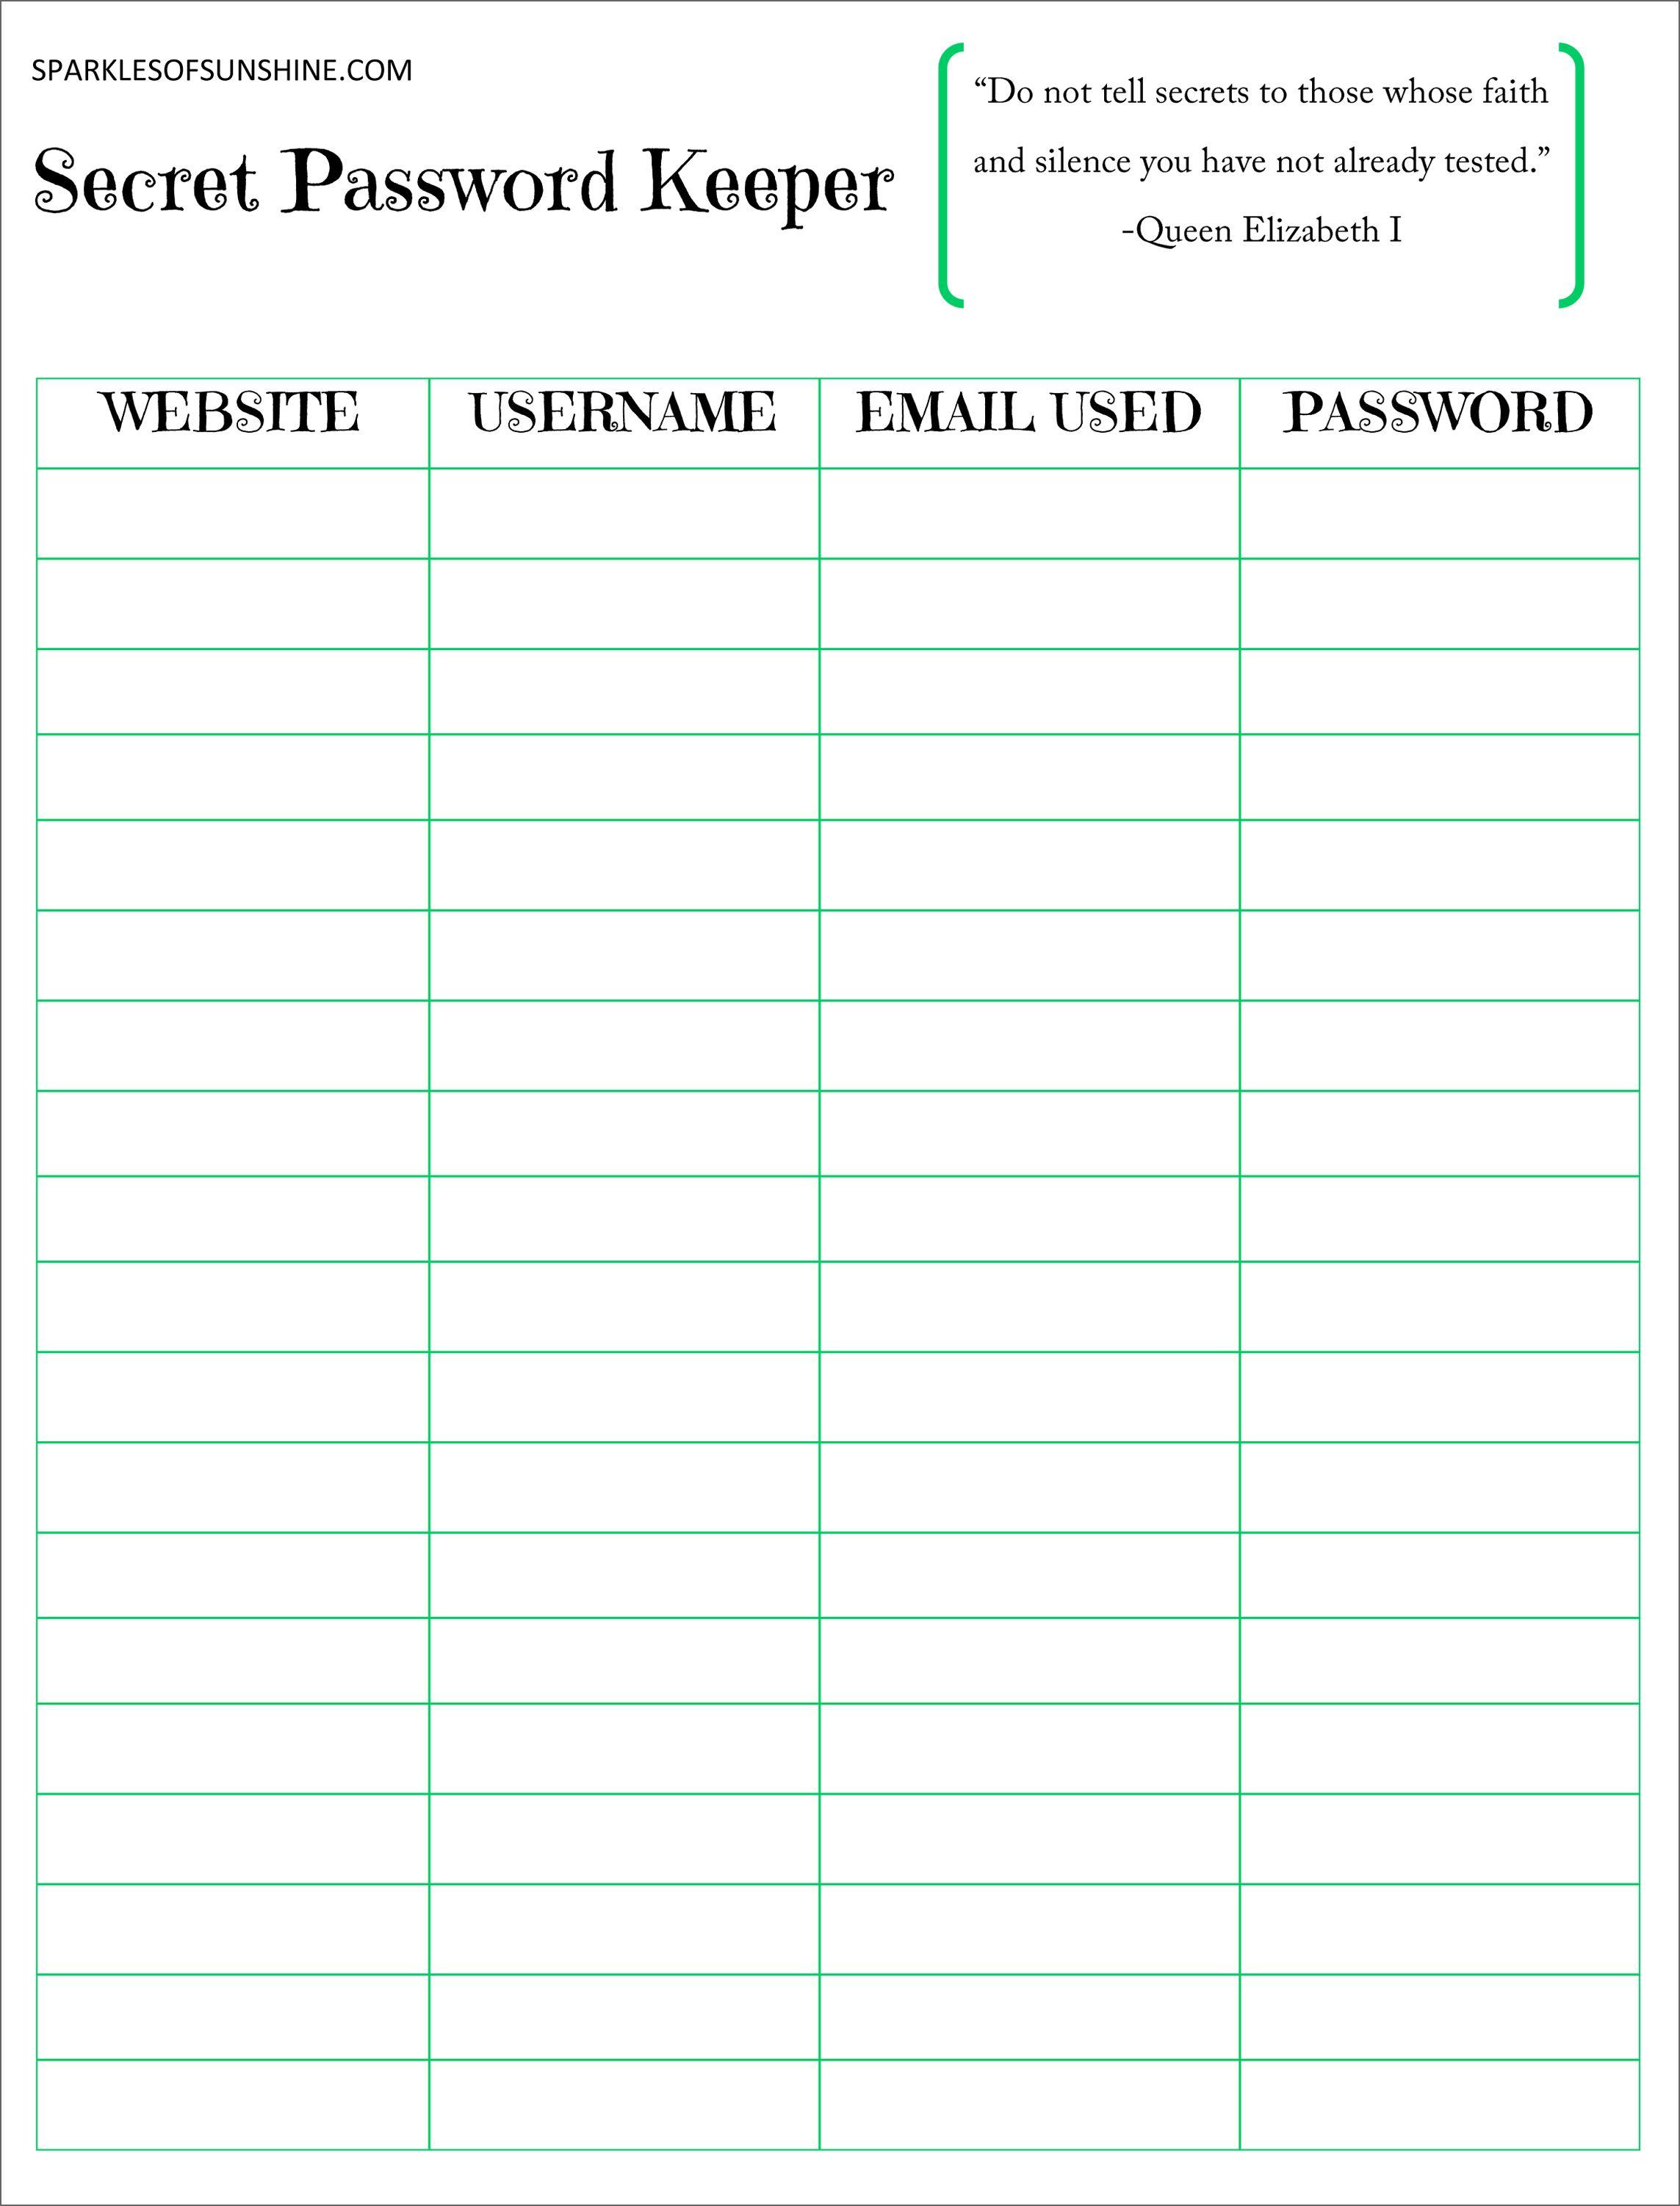 Secret Password Keeper Free Printable   Planners   Password Keeper - Free Printable Password Organizer